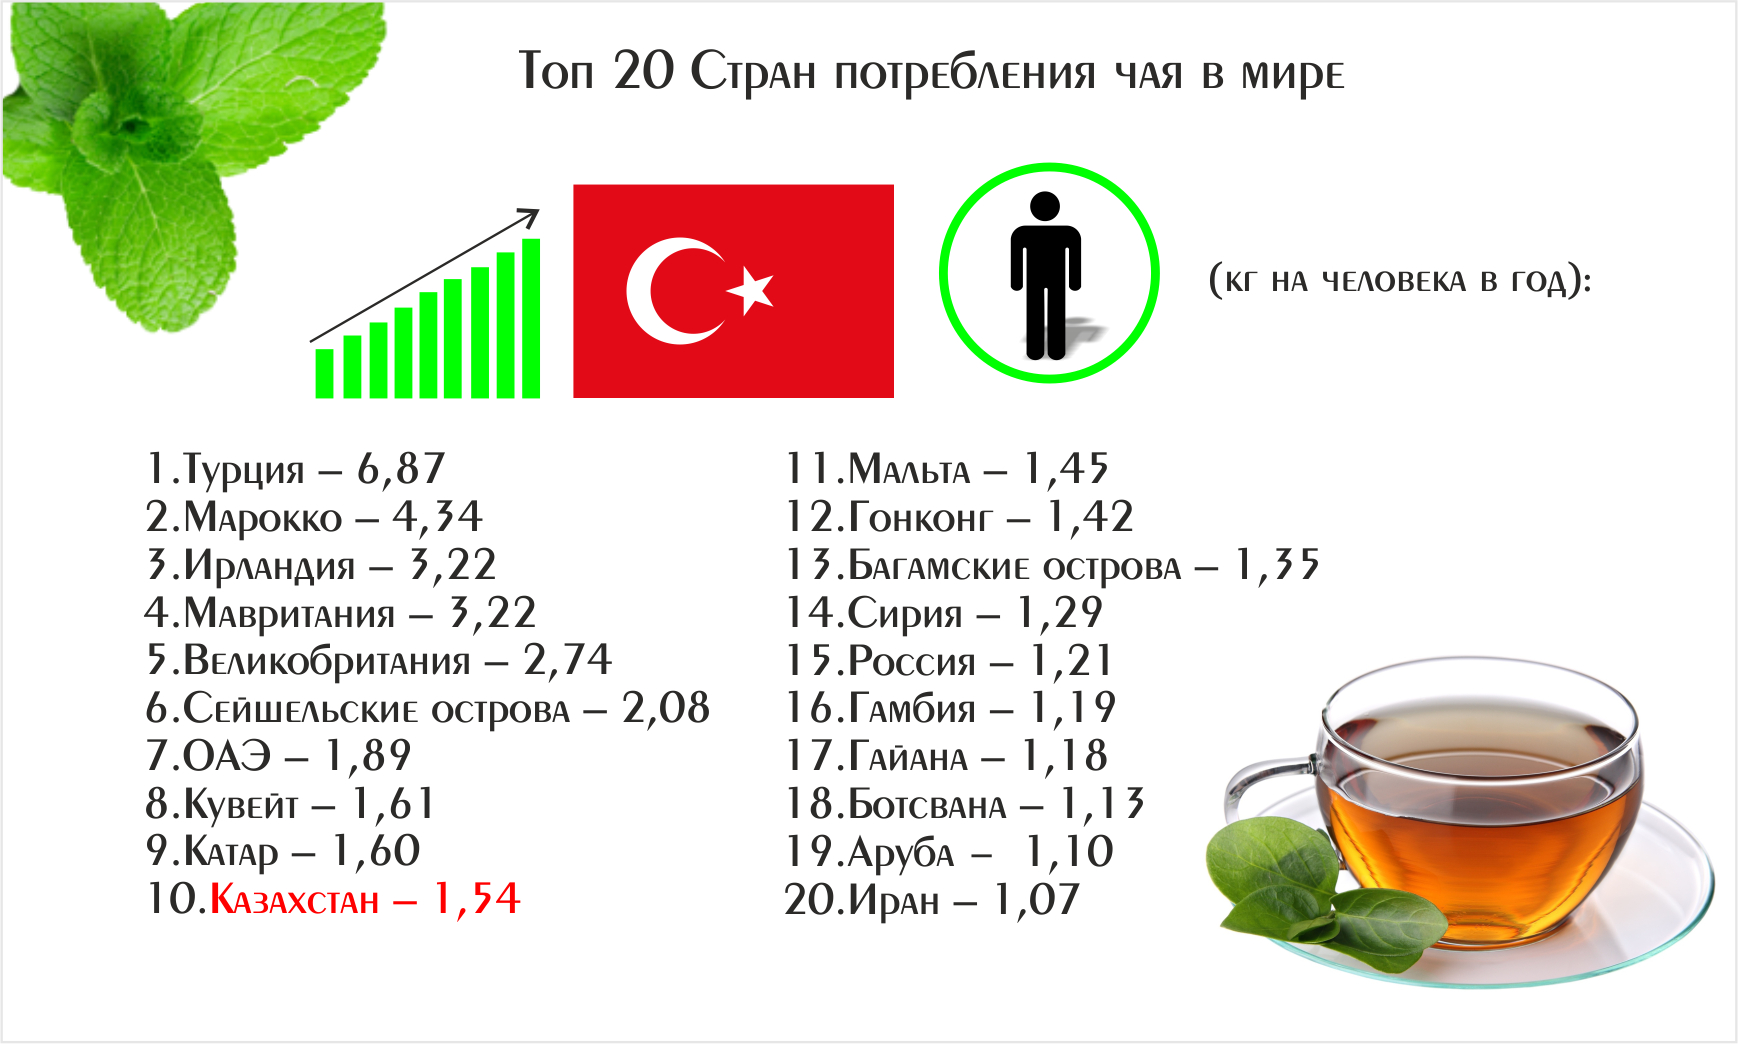 milk tea consumers preference